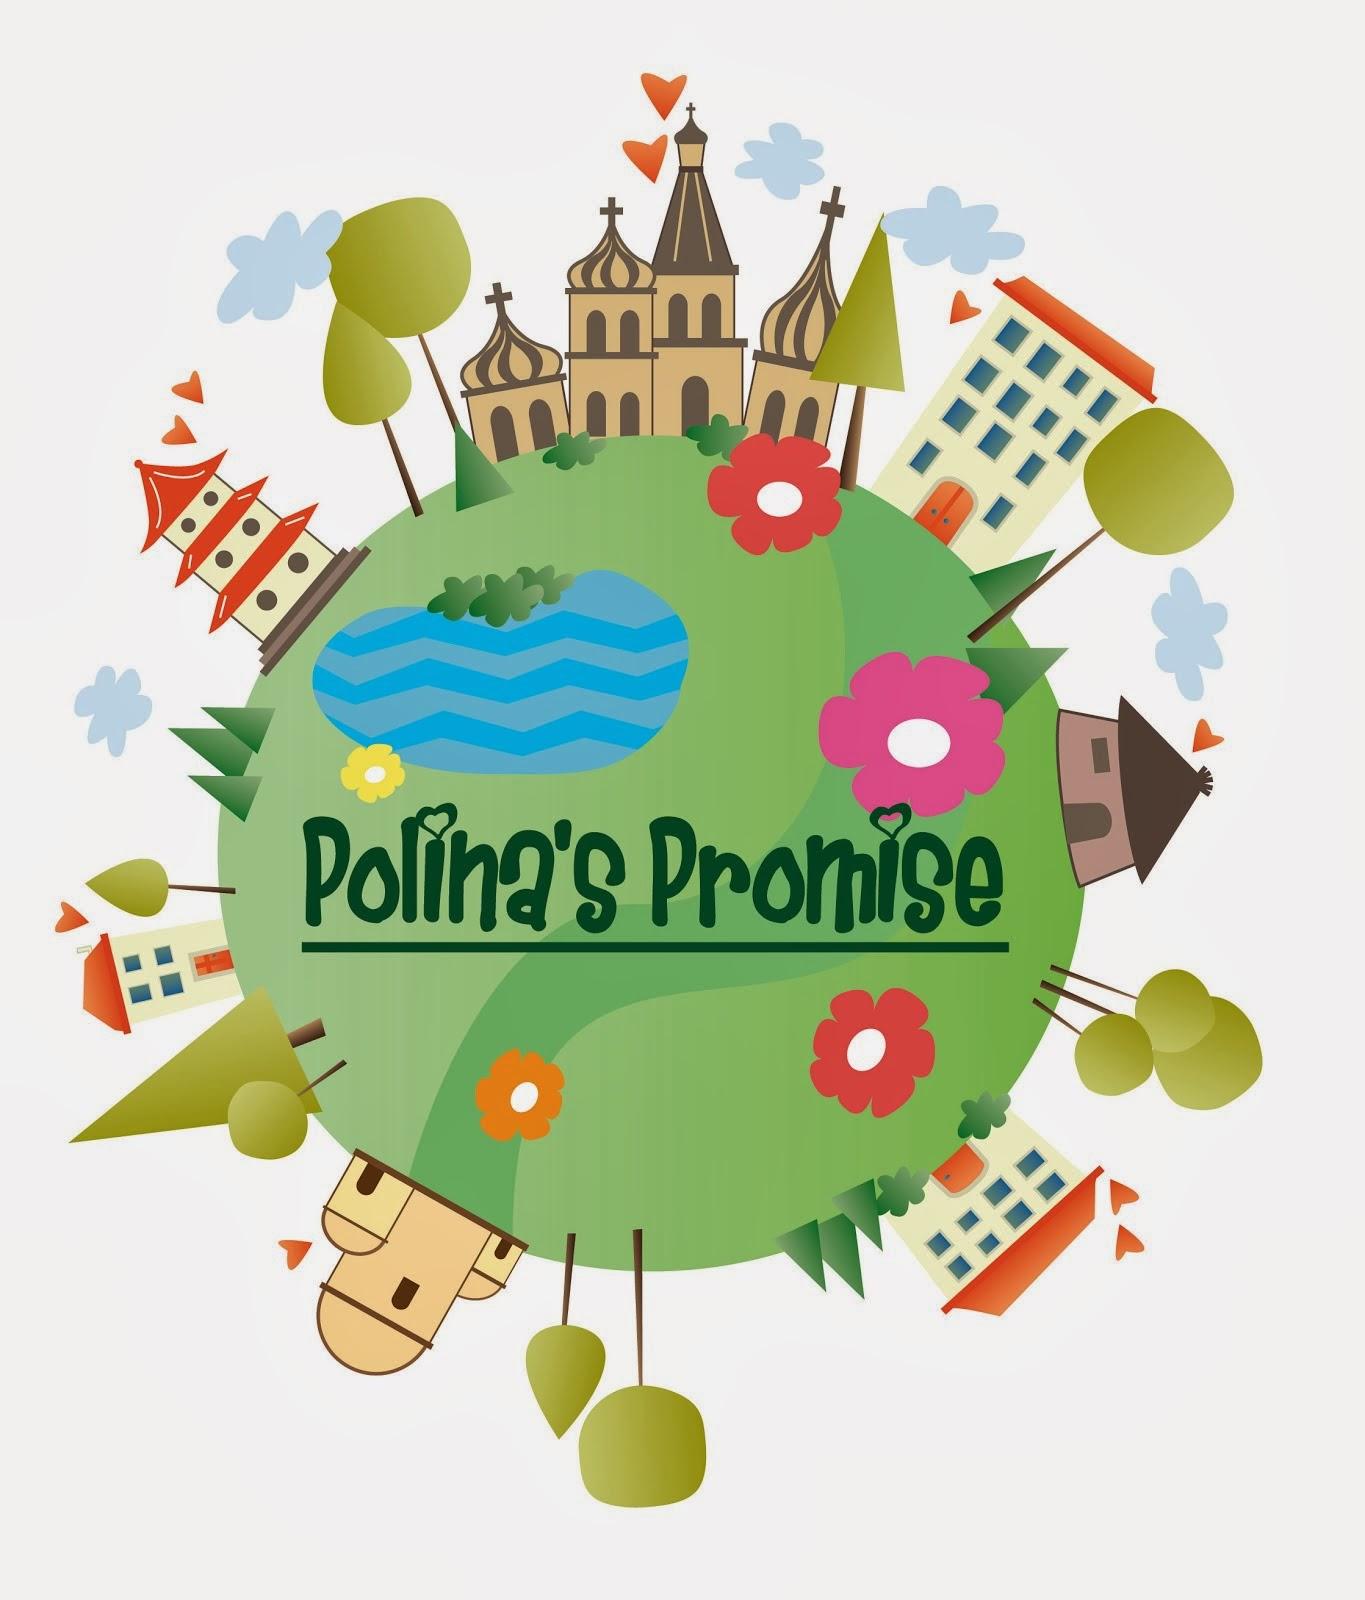 Polina's Promise Nonprofit